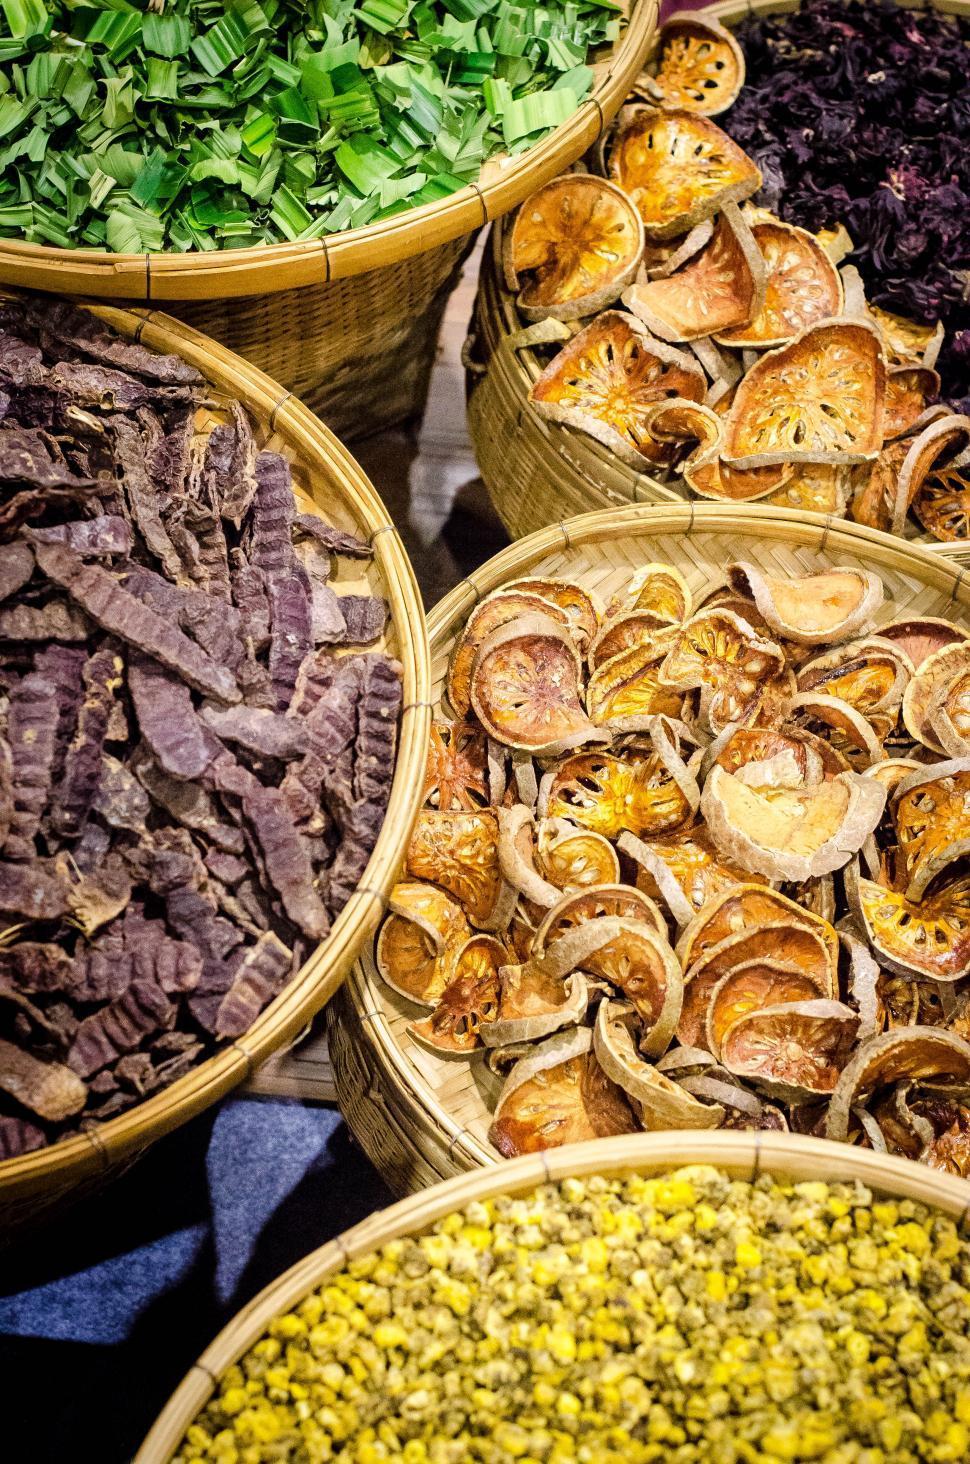 Download Free Stock HD Photo of Thai Herbs in wicker baskets Online